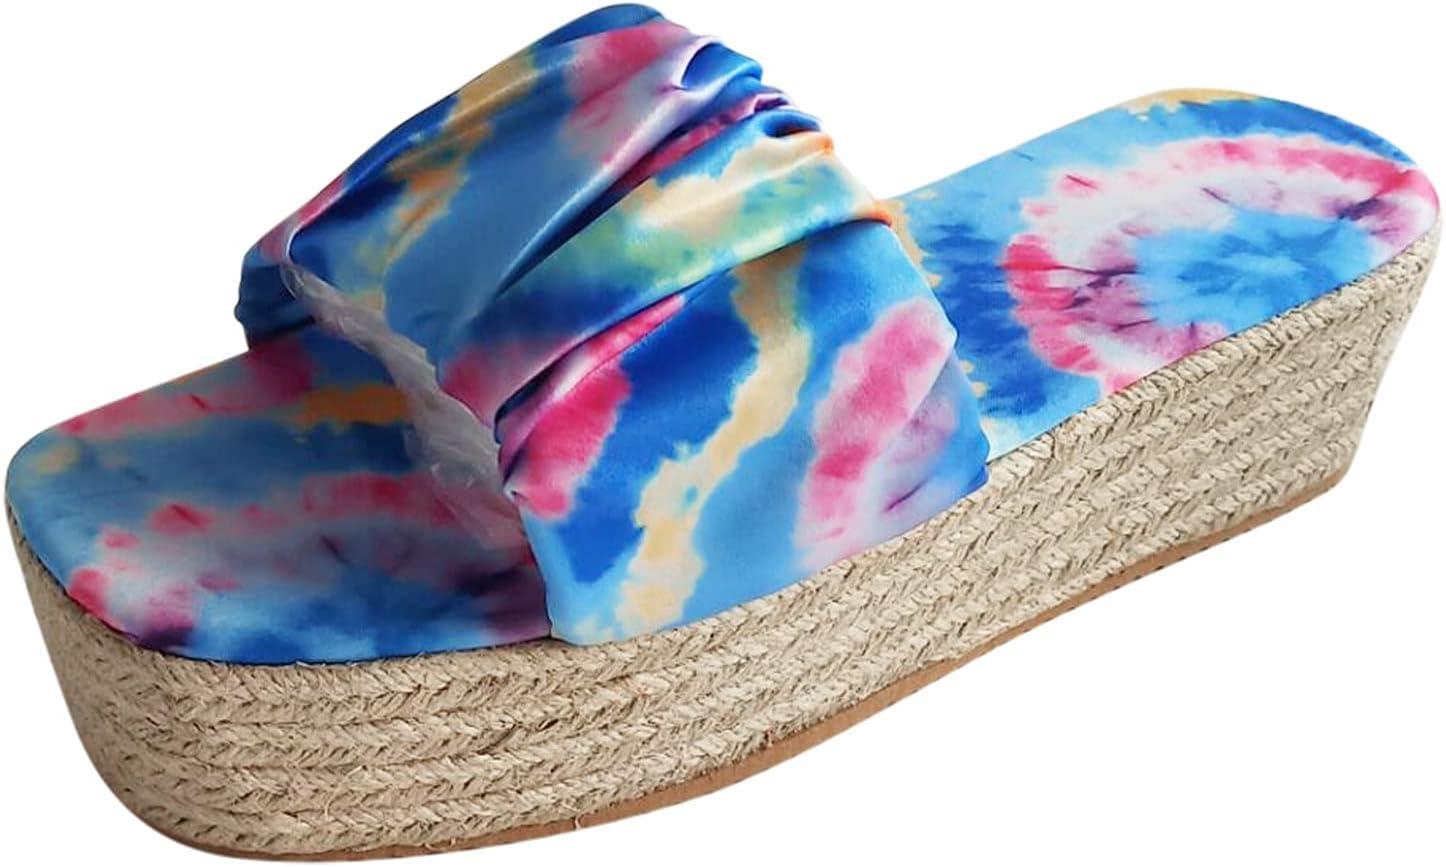 PLENTOP Platform Wedge Sandals for Max 85% OFF Toe Open Be Breathable Luxury goods Women